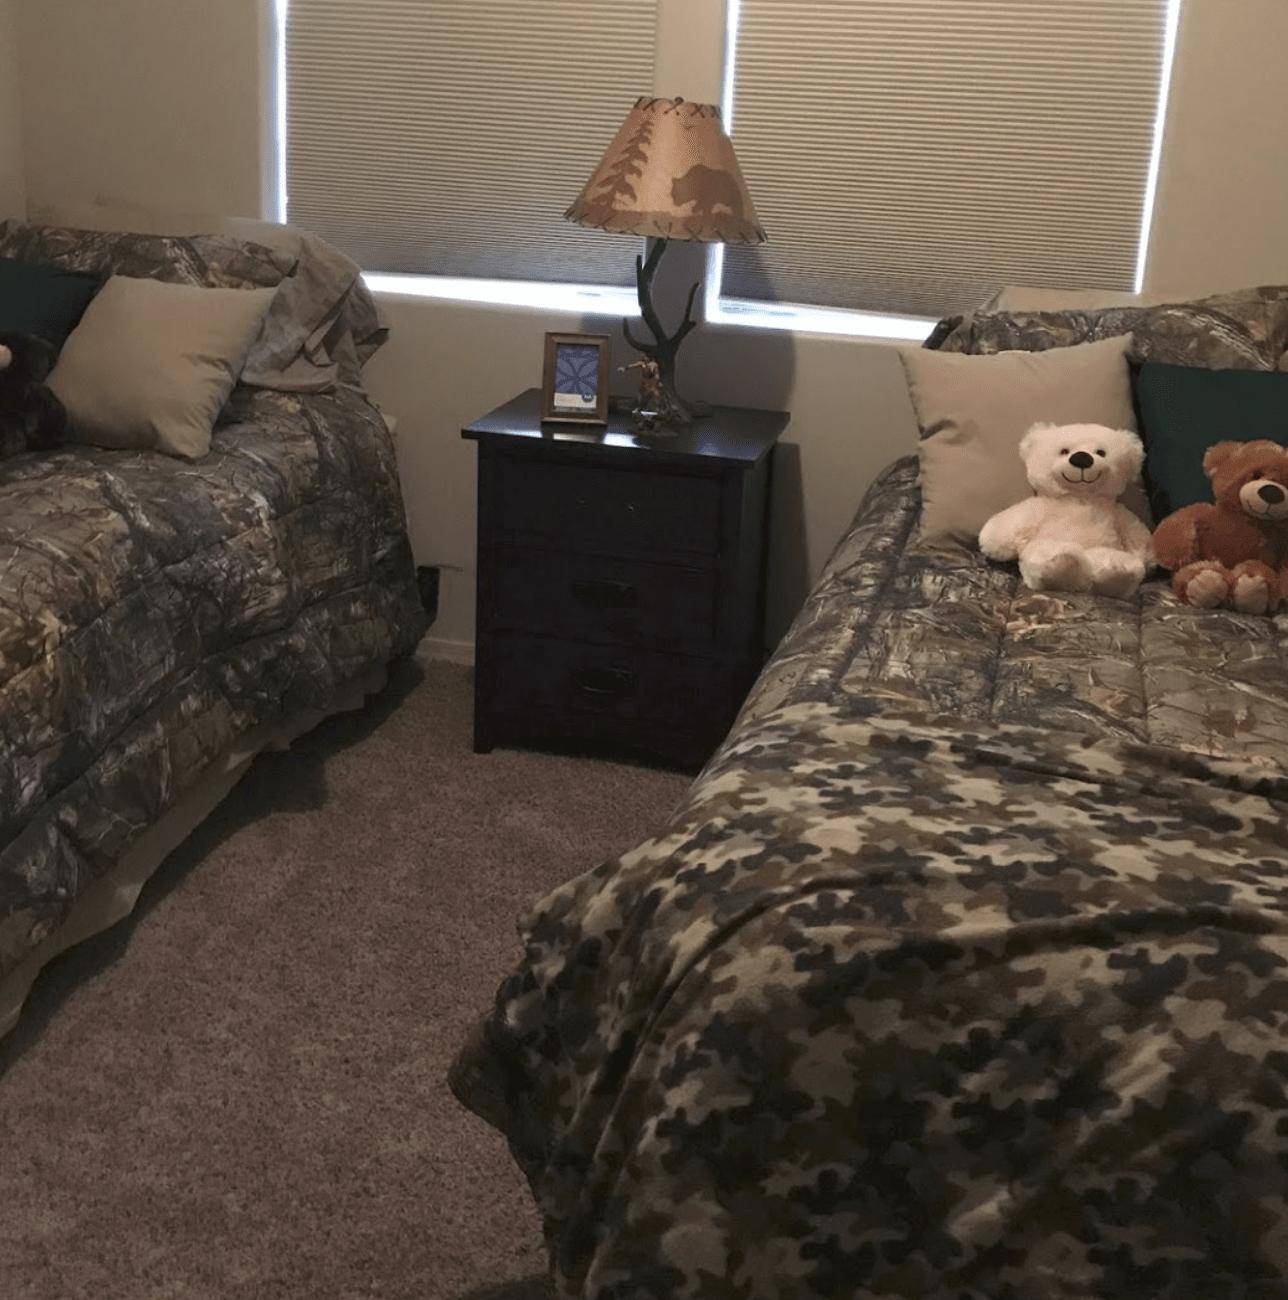 Carpet flooring from Taylors Flooring in Mesa, AZ